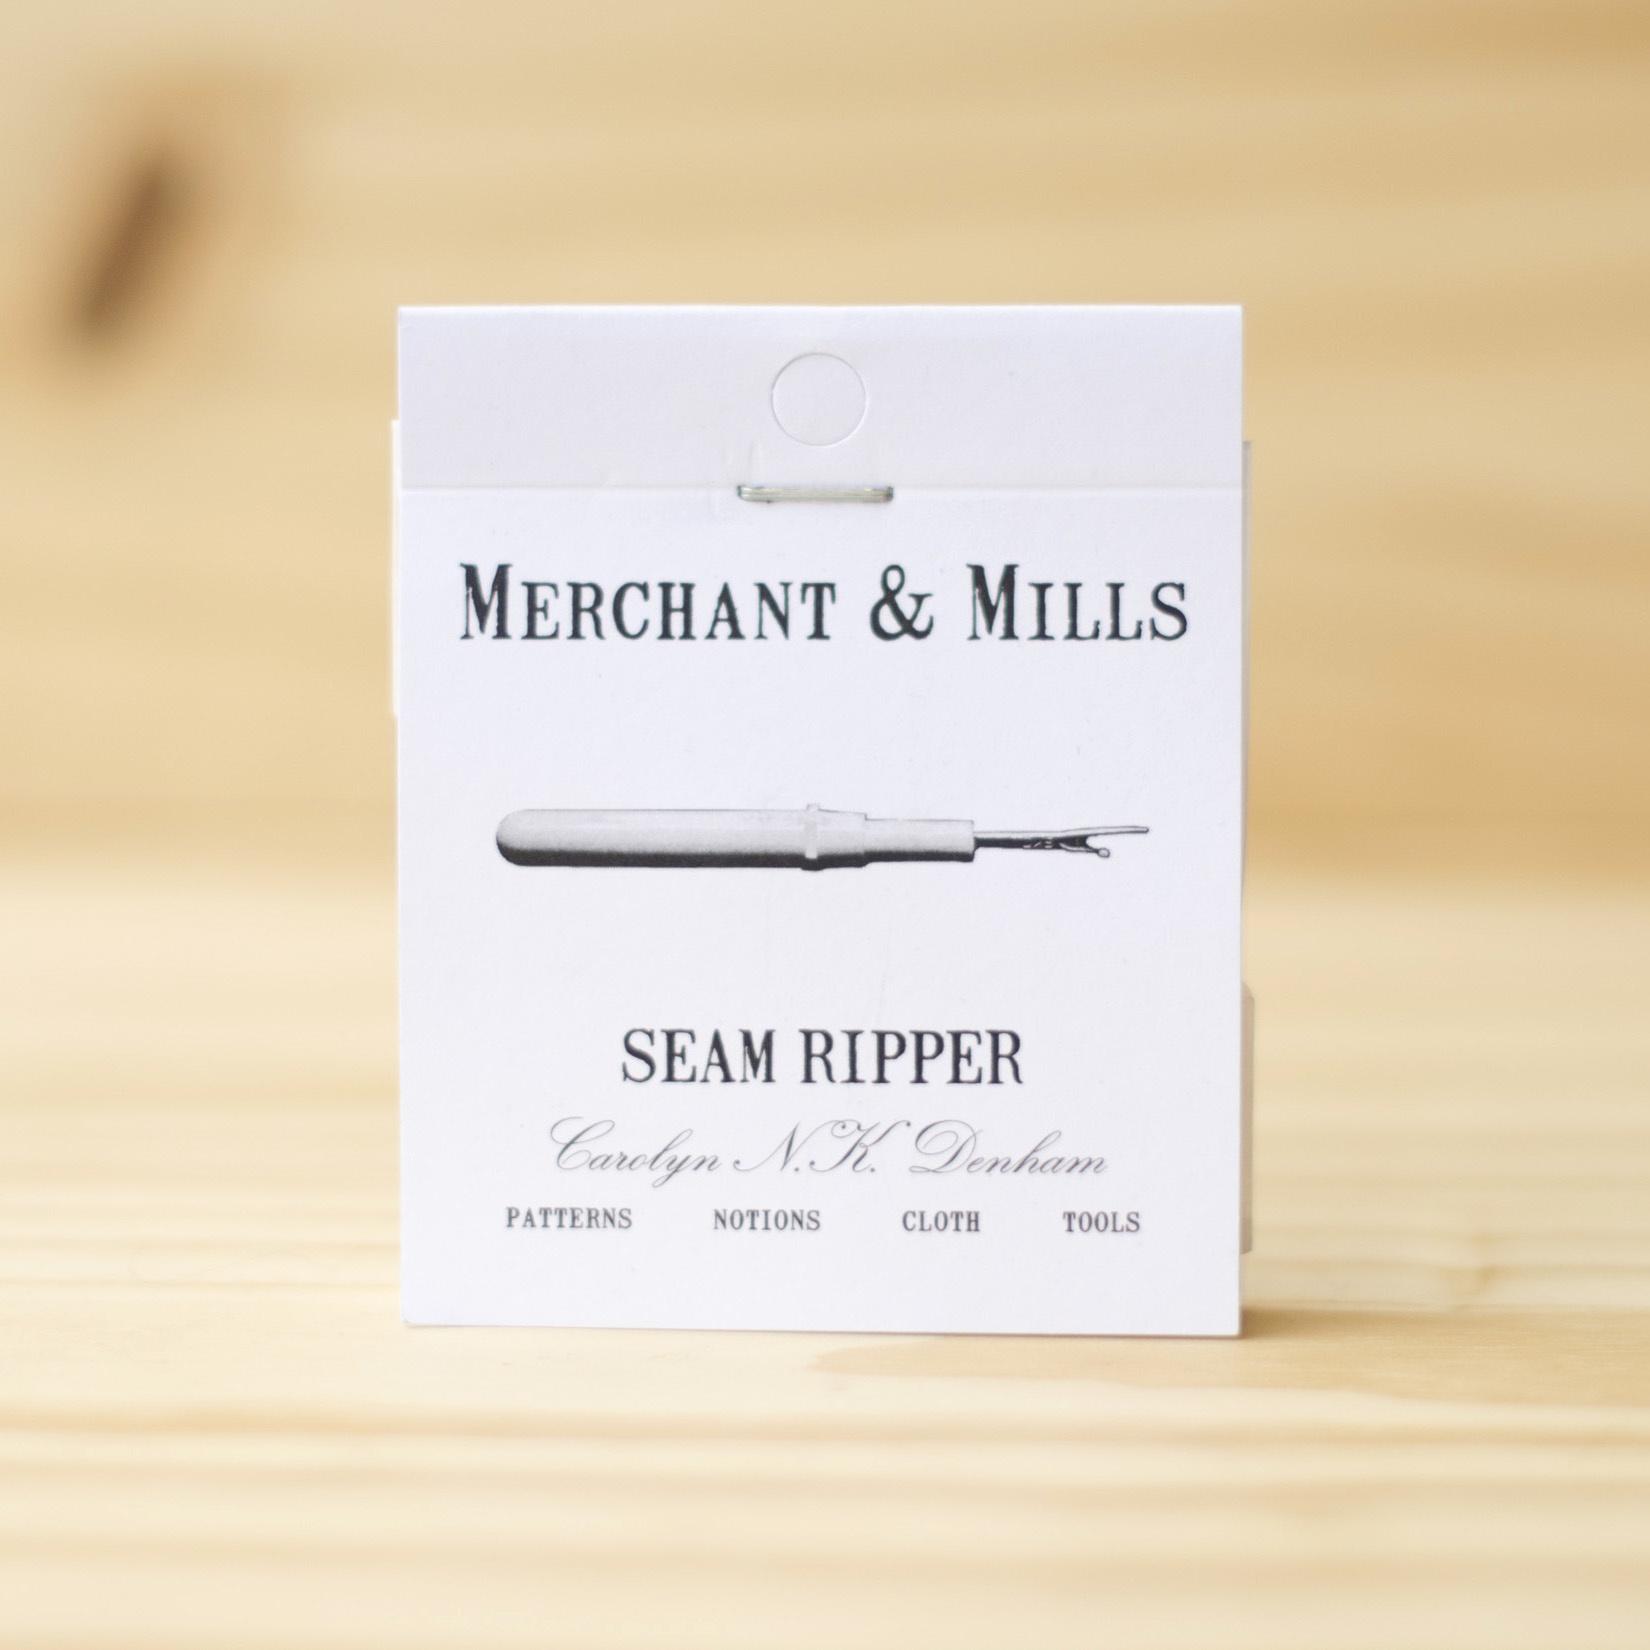 Merchant & Mills : Seam Ripper